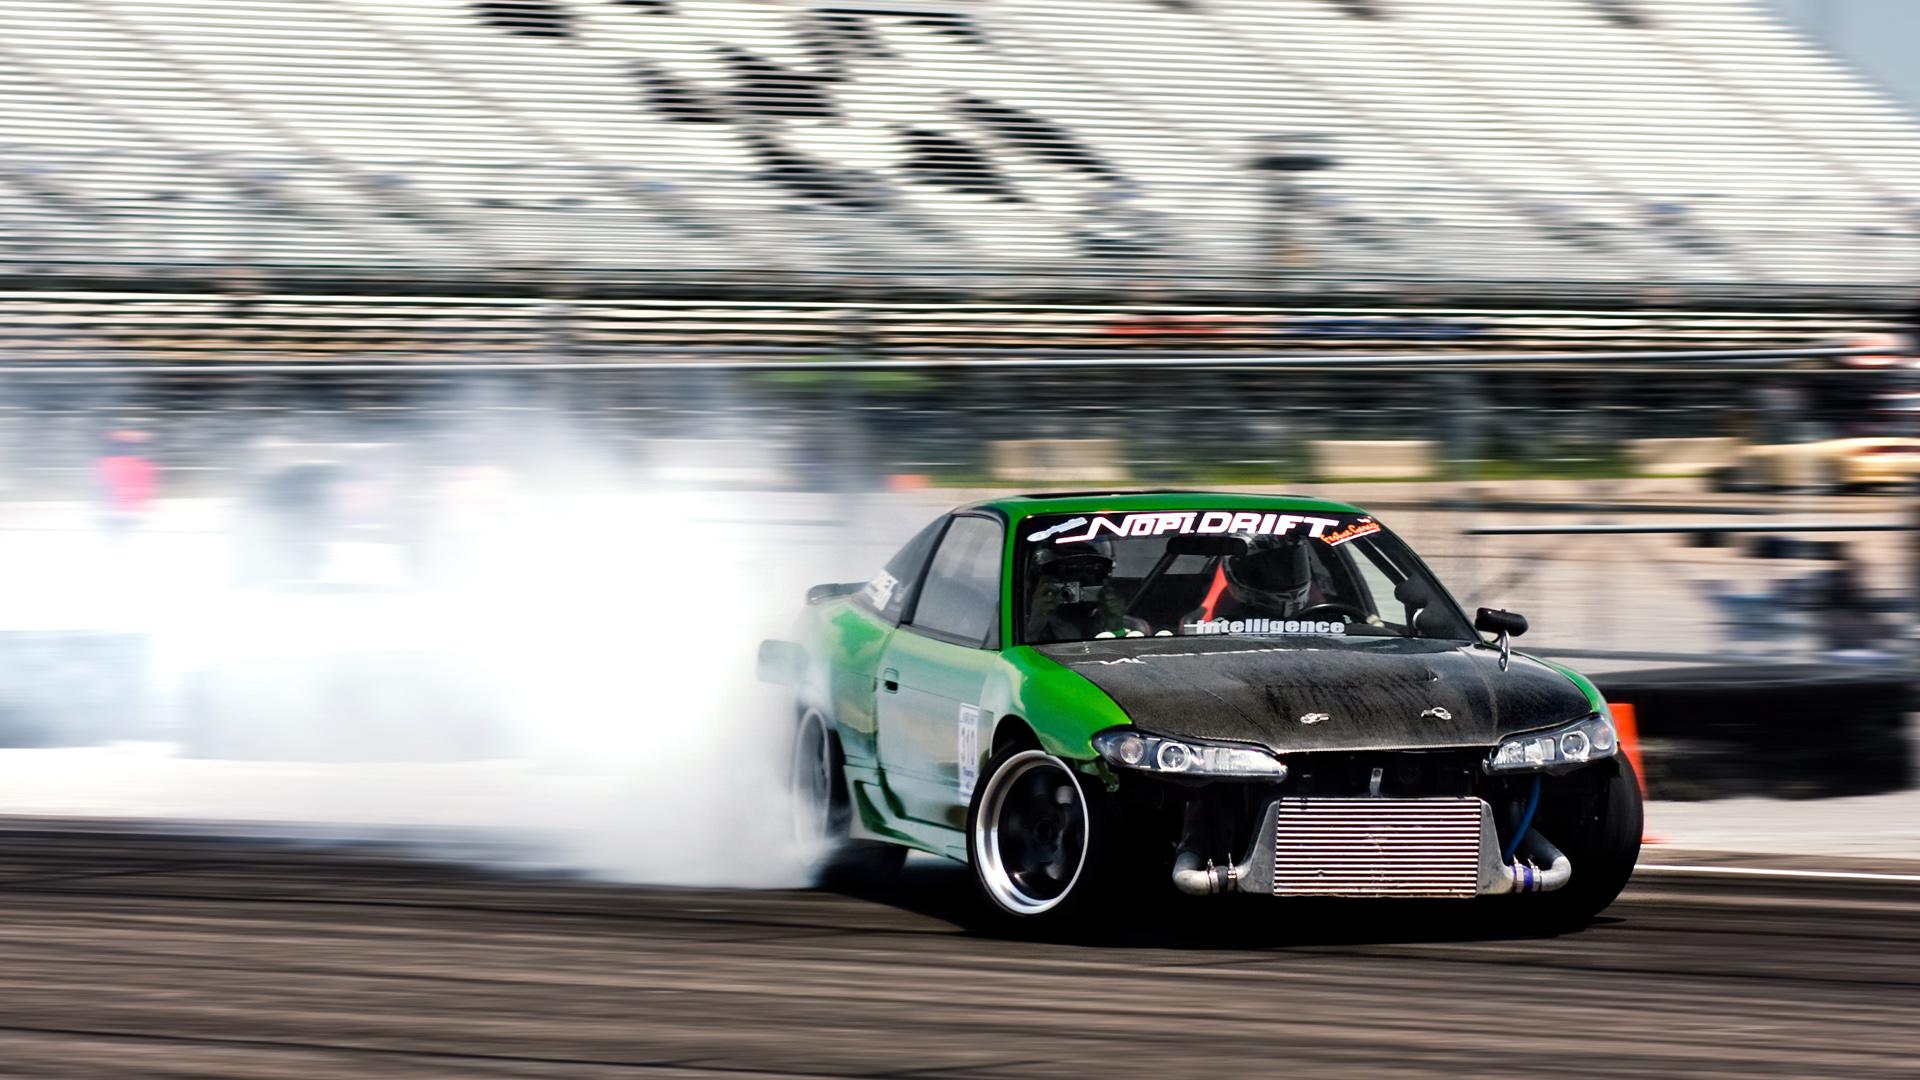 drifting cars wallpaper 1920x1080